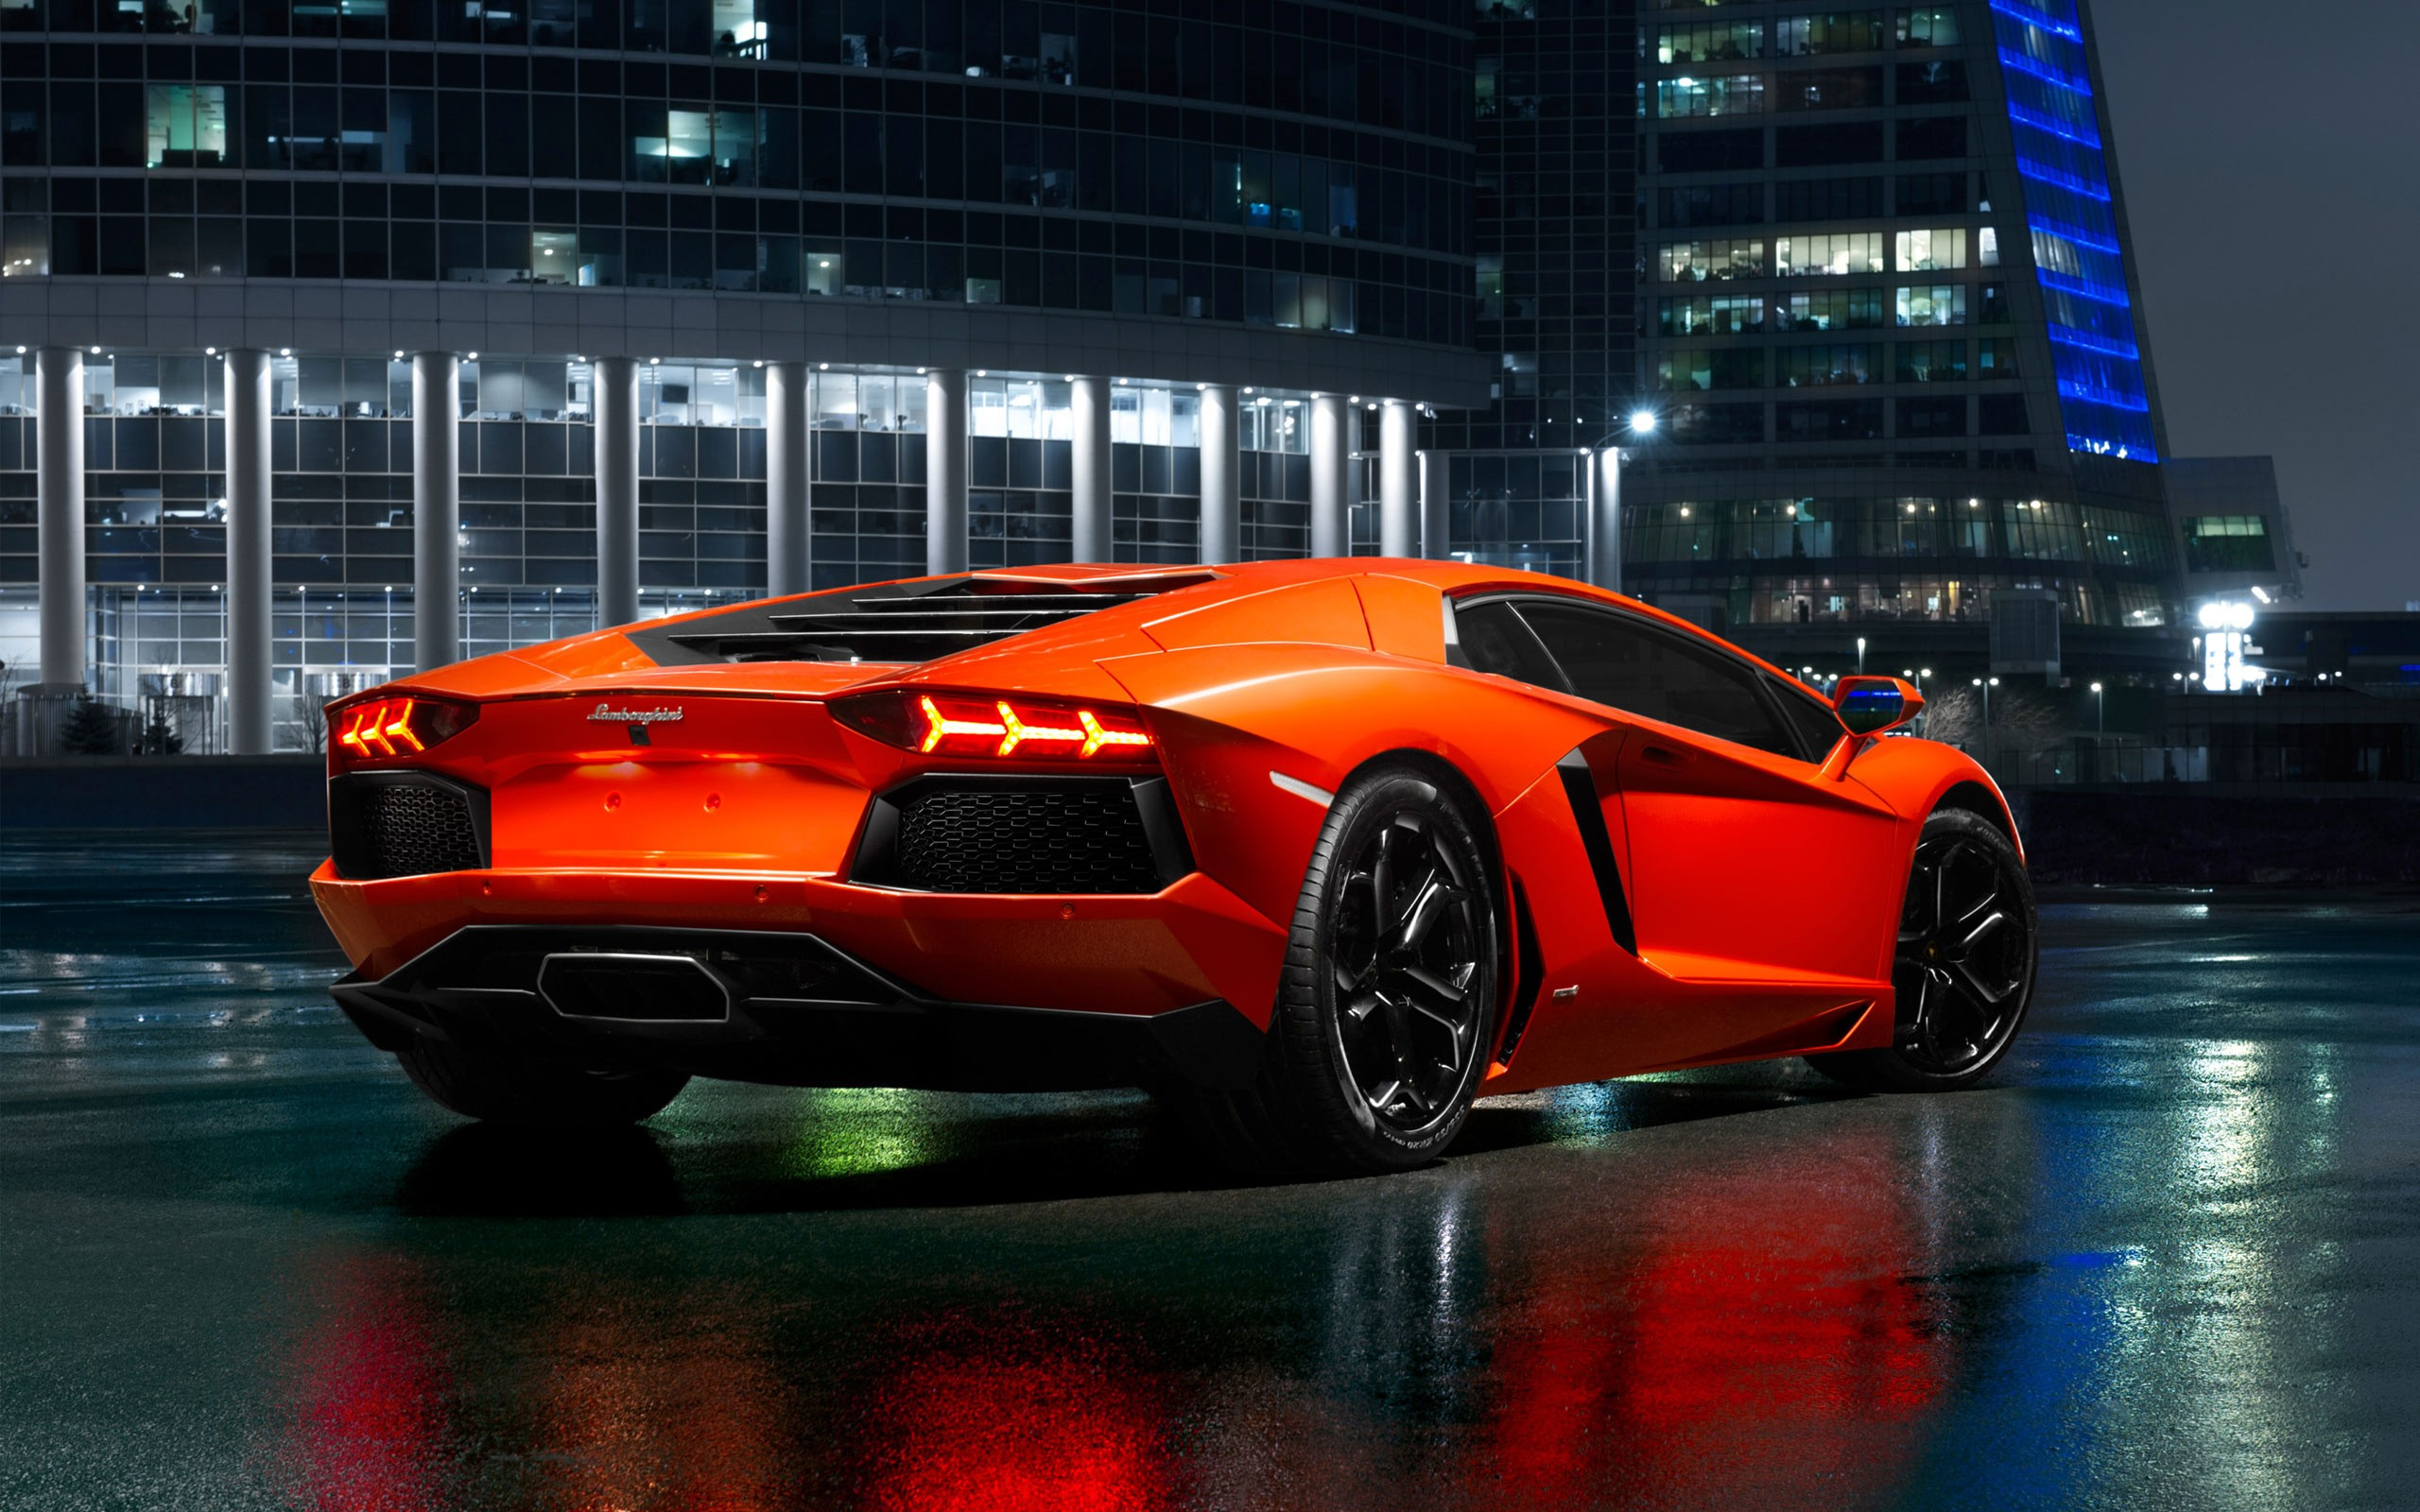 Lamborghini Aventador LP700 4 5 Wallpaper | HD Car ...